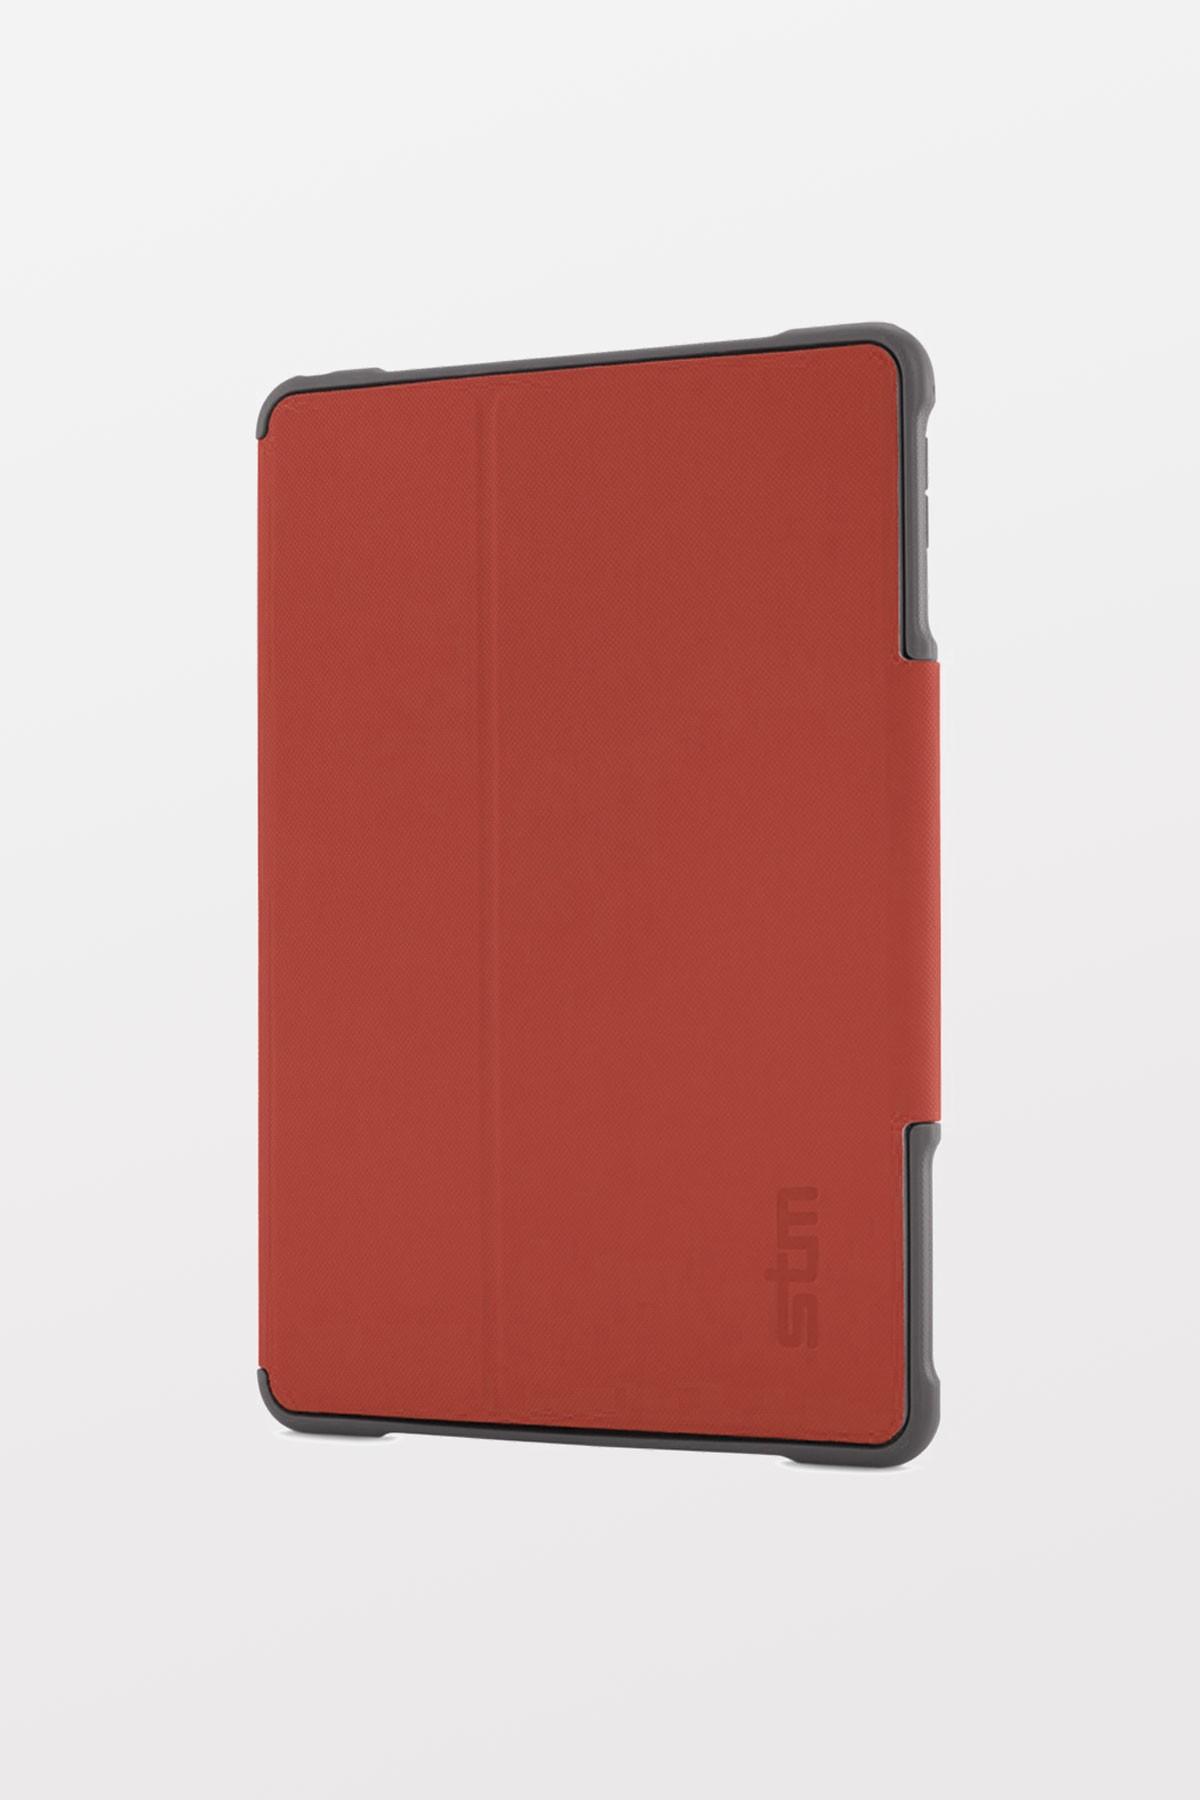 STM Dux for iPad Mini 4/Mini 5 - Red